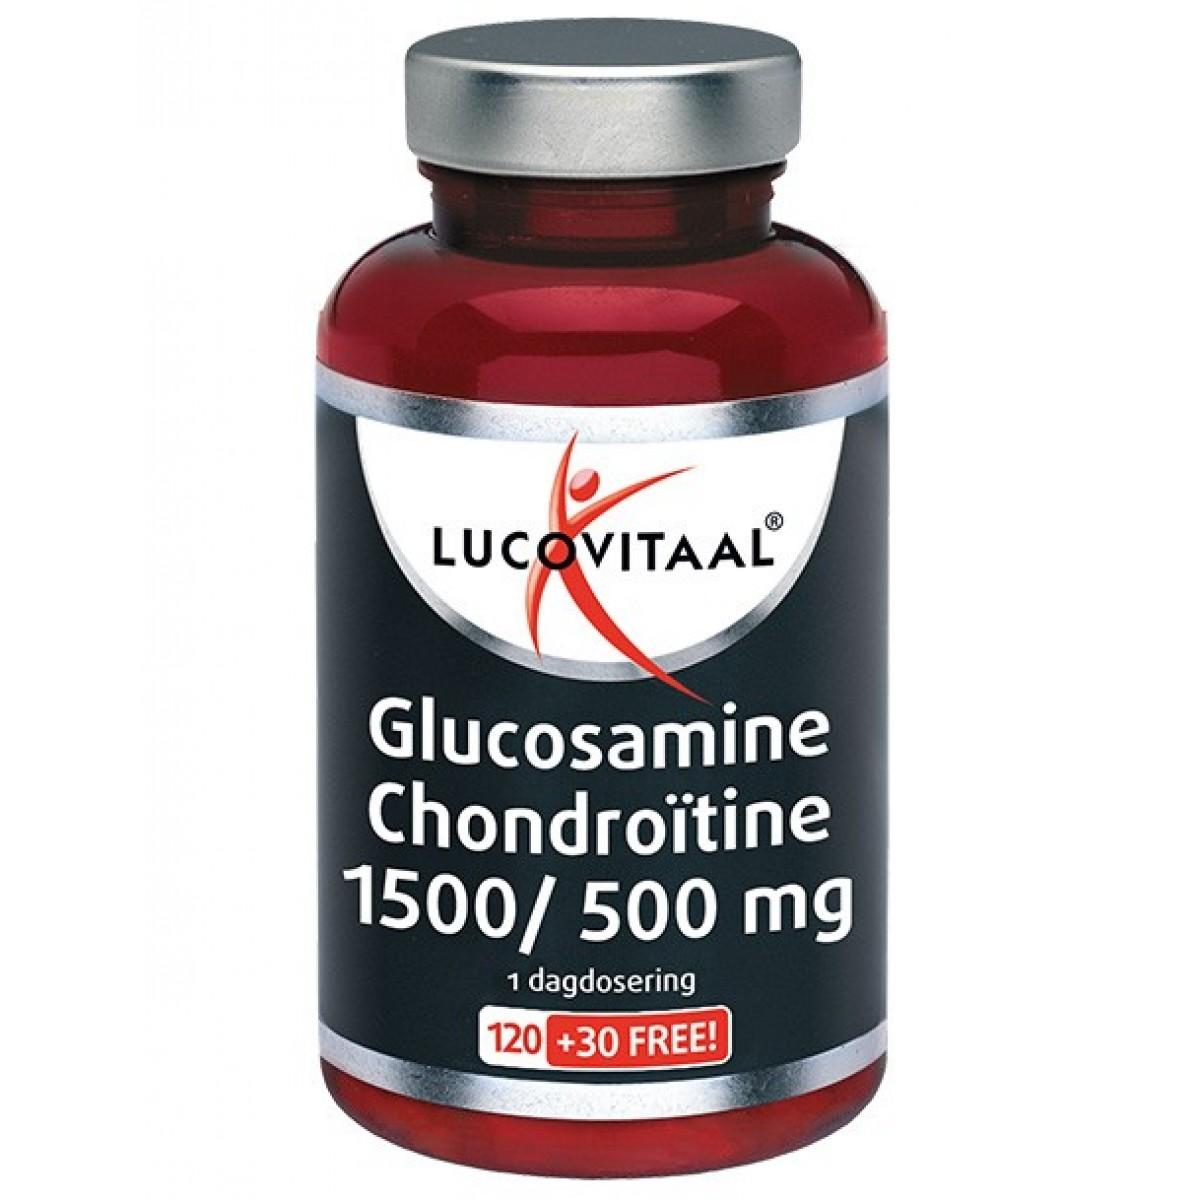 Glucosamine Chondroïtine